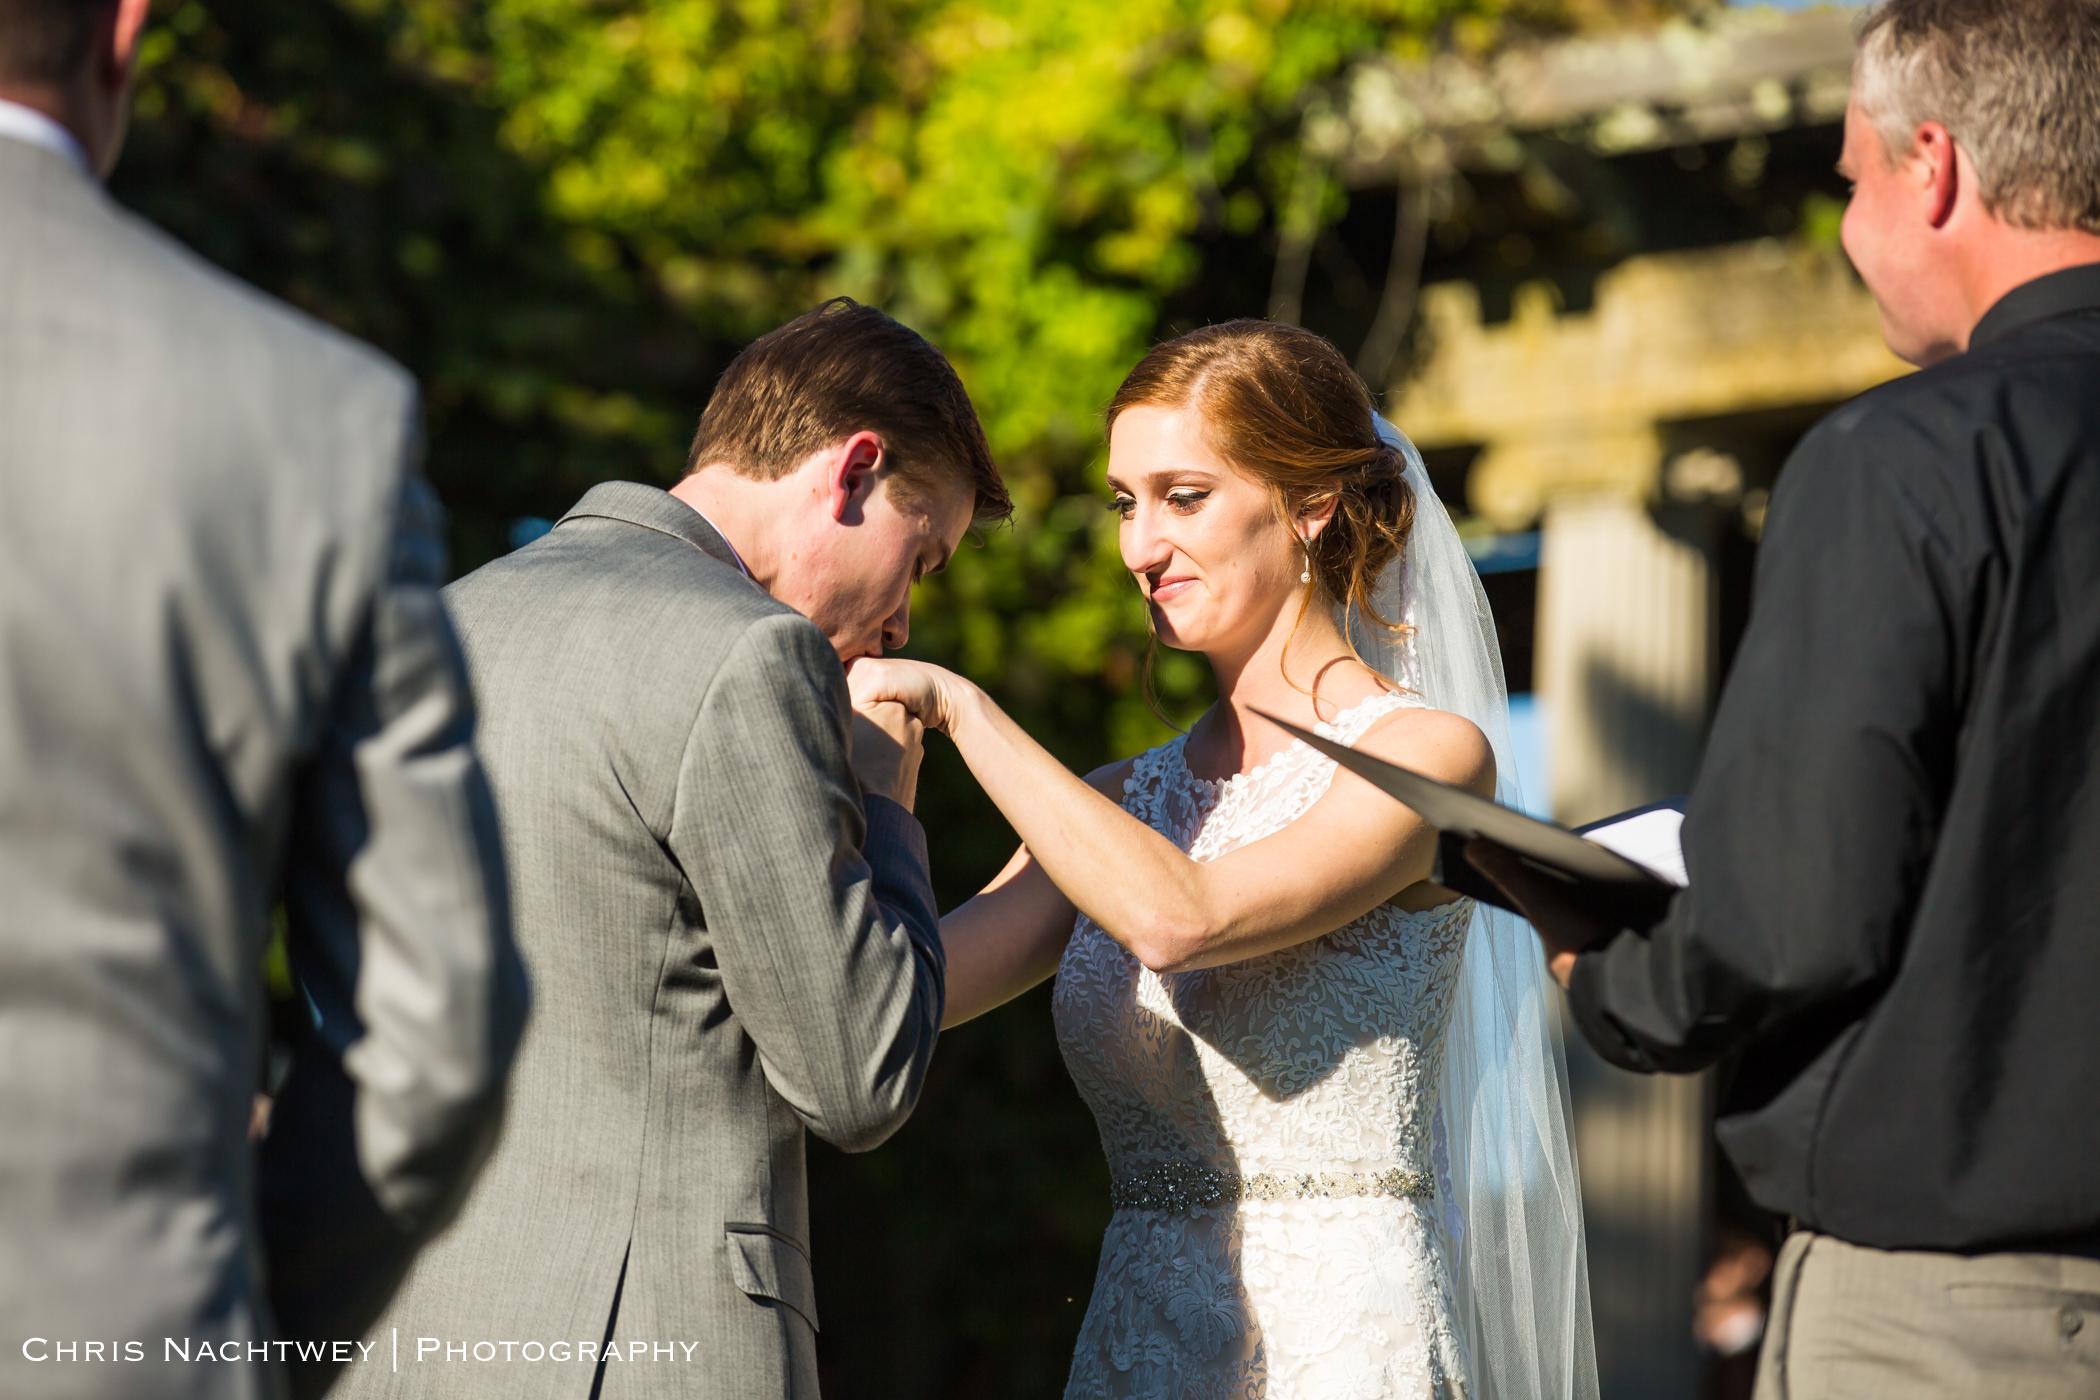 harkness-wedding-photos-chris-nachtwey-photography-2018-13.jpg